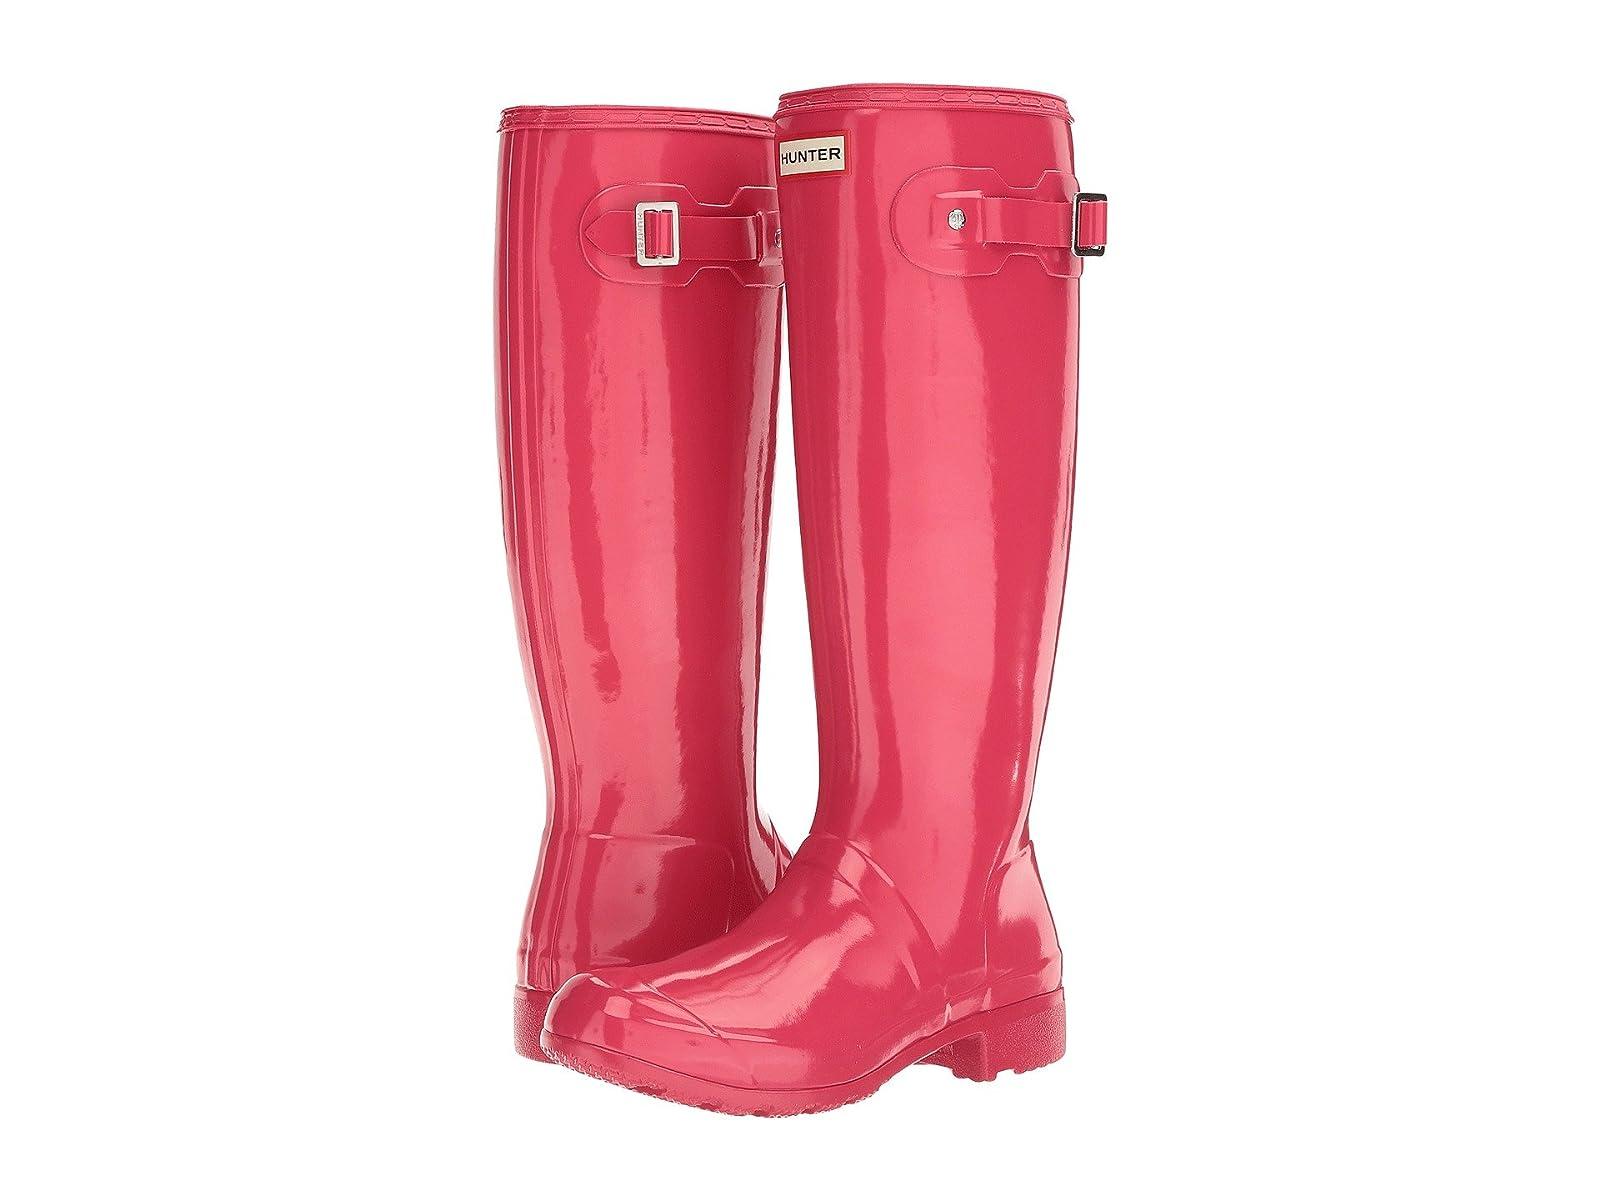 Hunter Original Tour Gloss Packable Rain BootCheap and distinctive eye-catching shoes